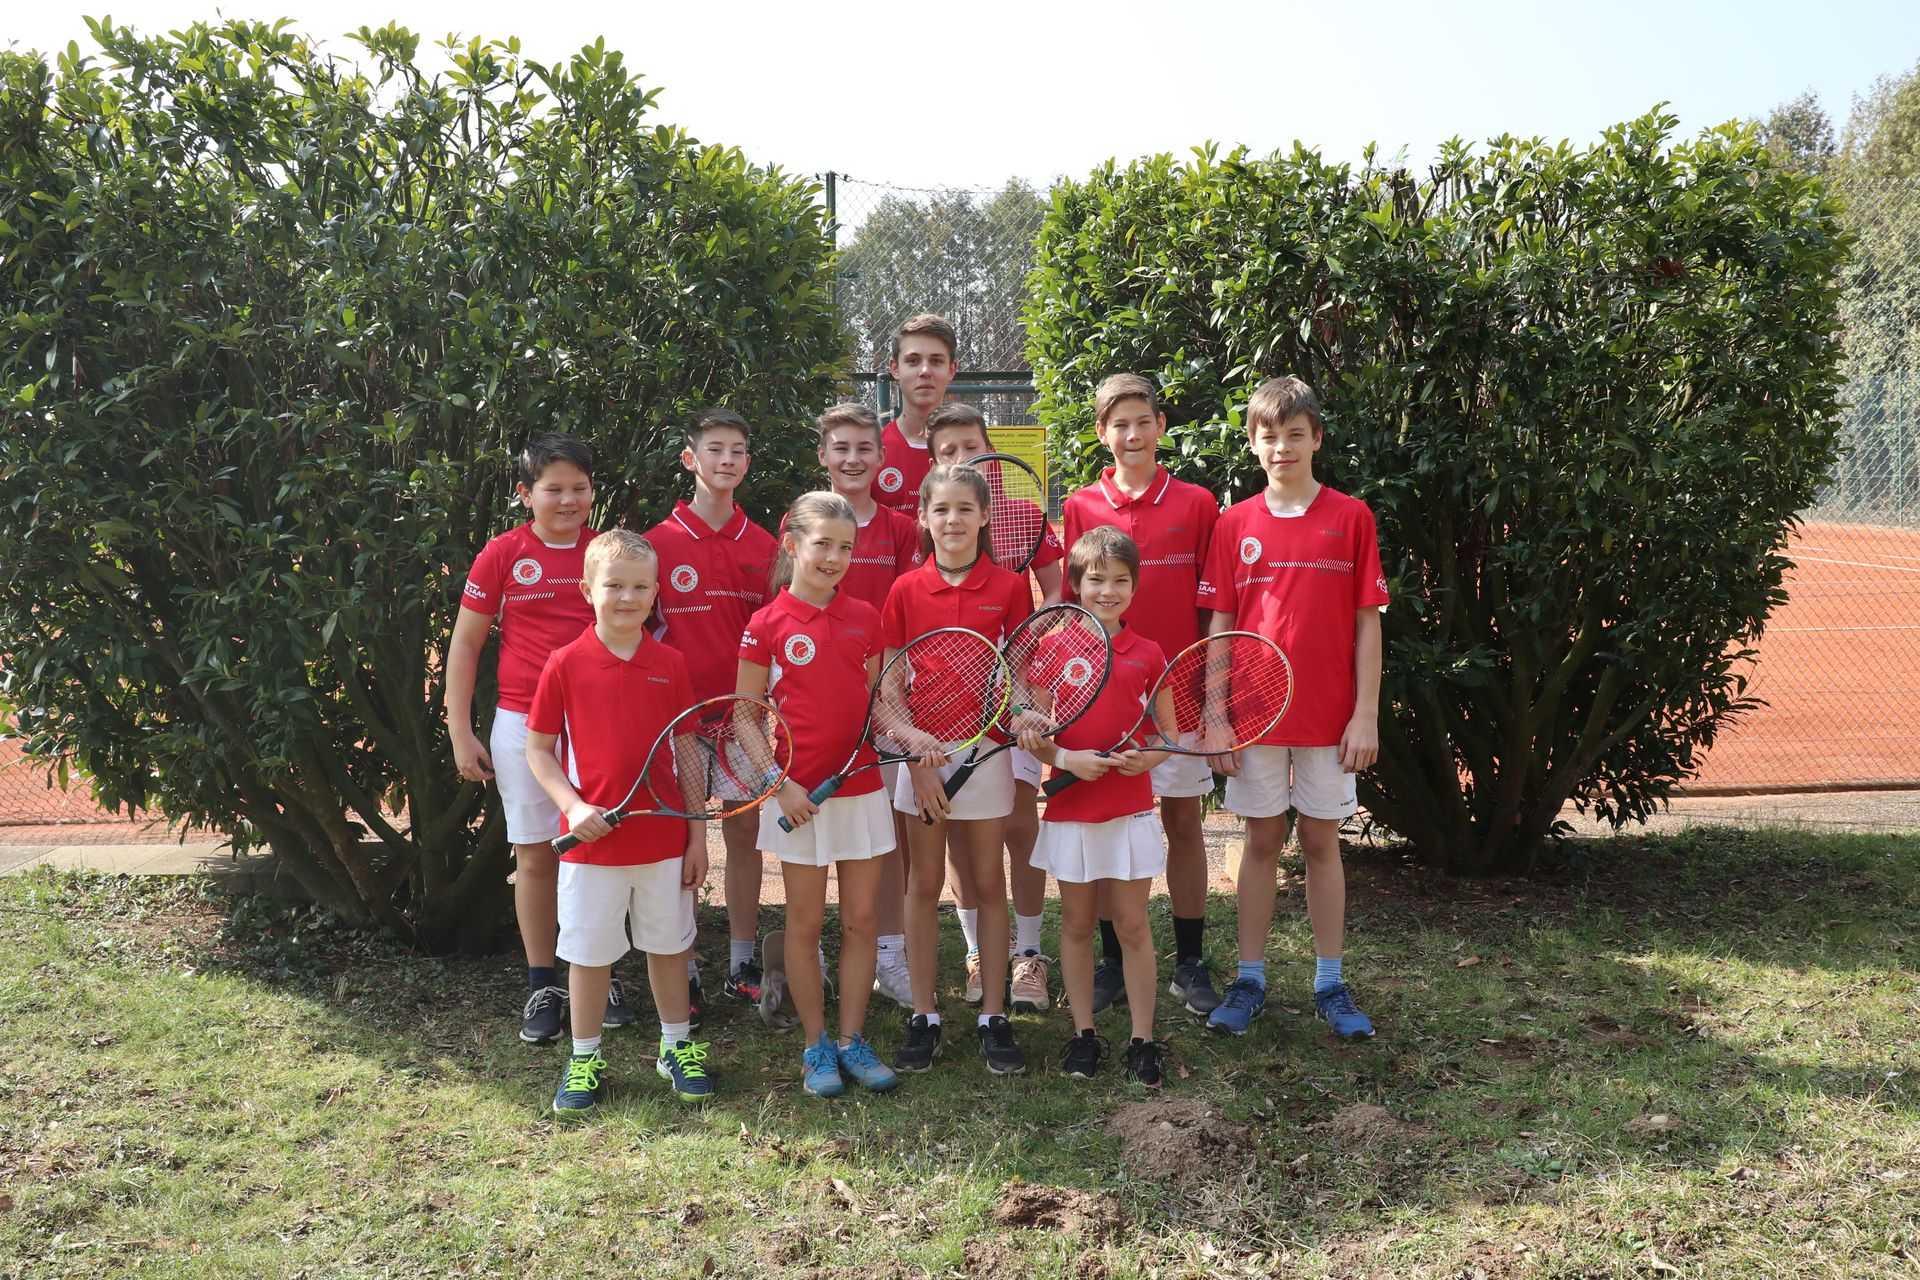 Tennisverein Kenzingen manschafte 12